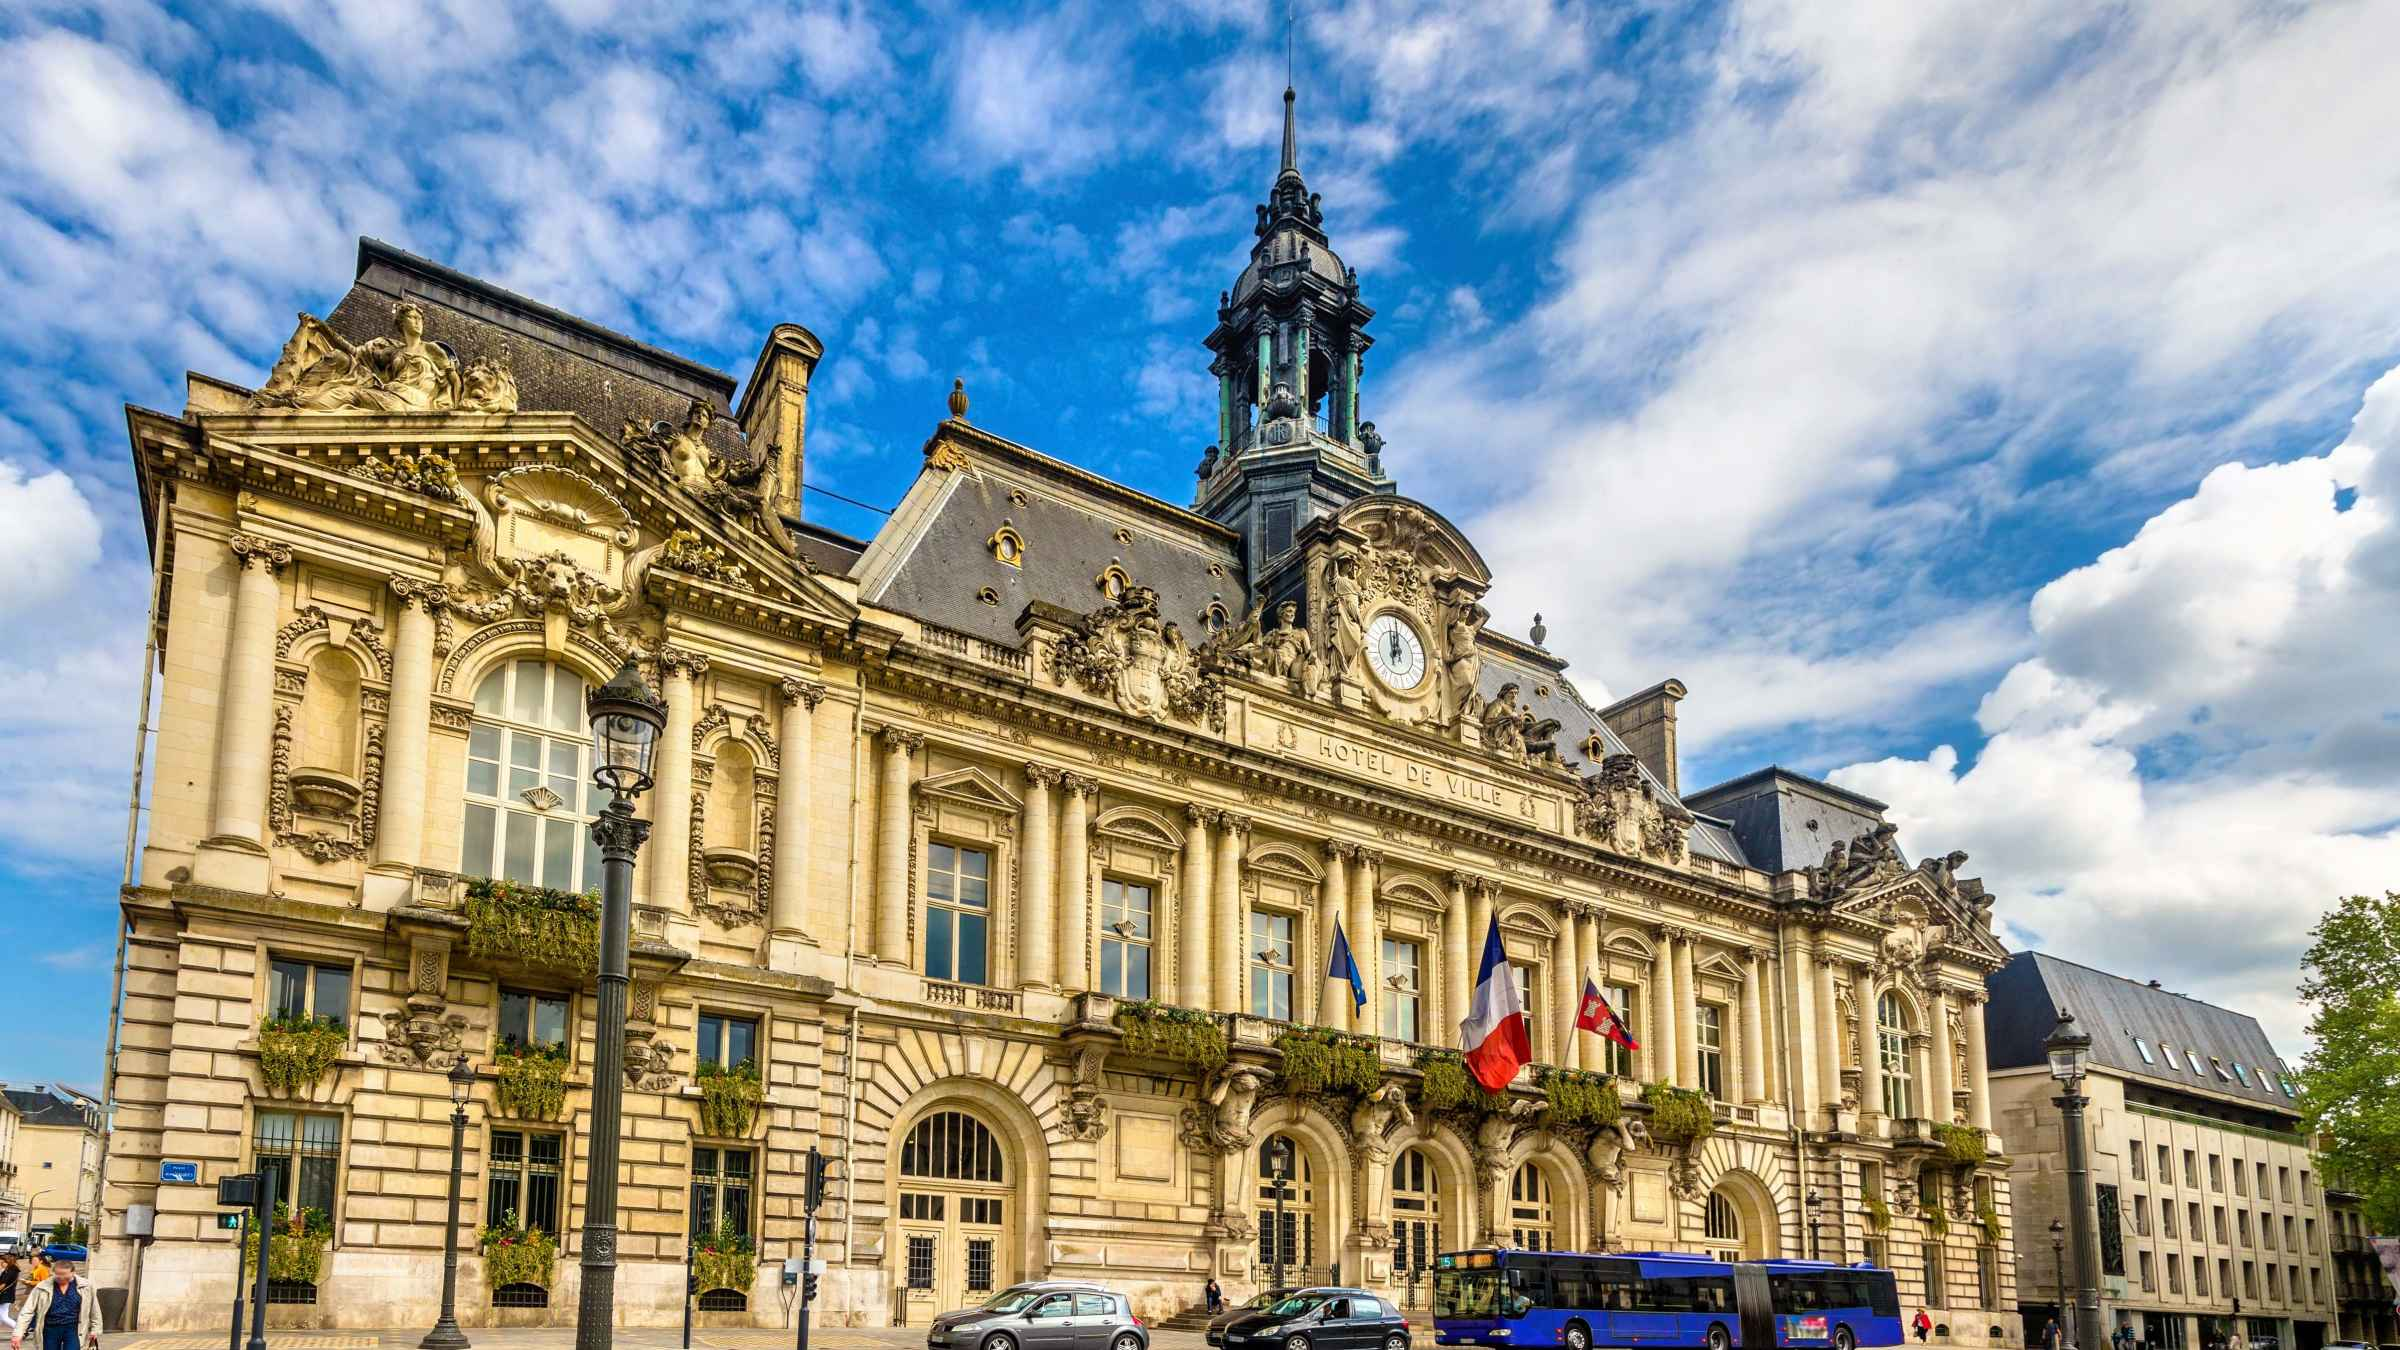 Tours, France 21 Top 21 Tours & Activities with Photos ...